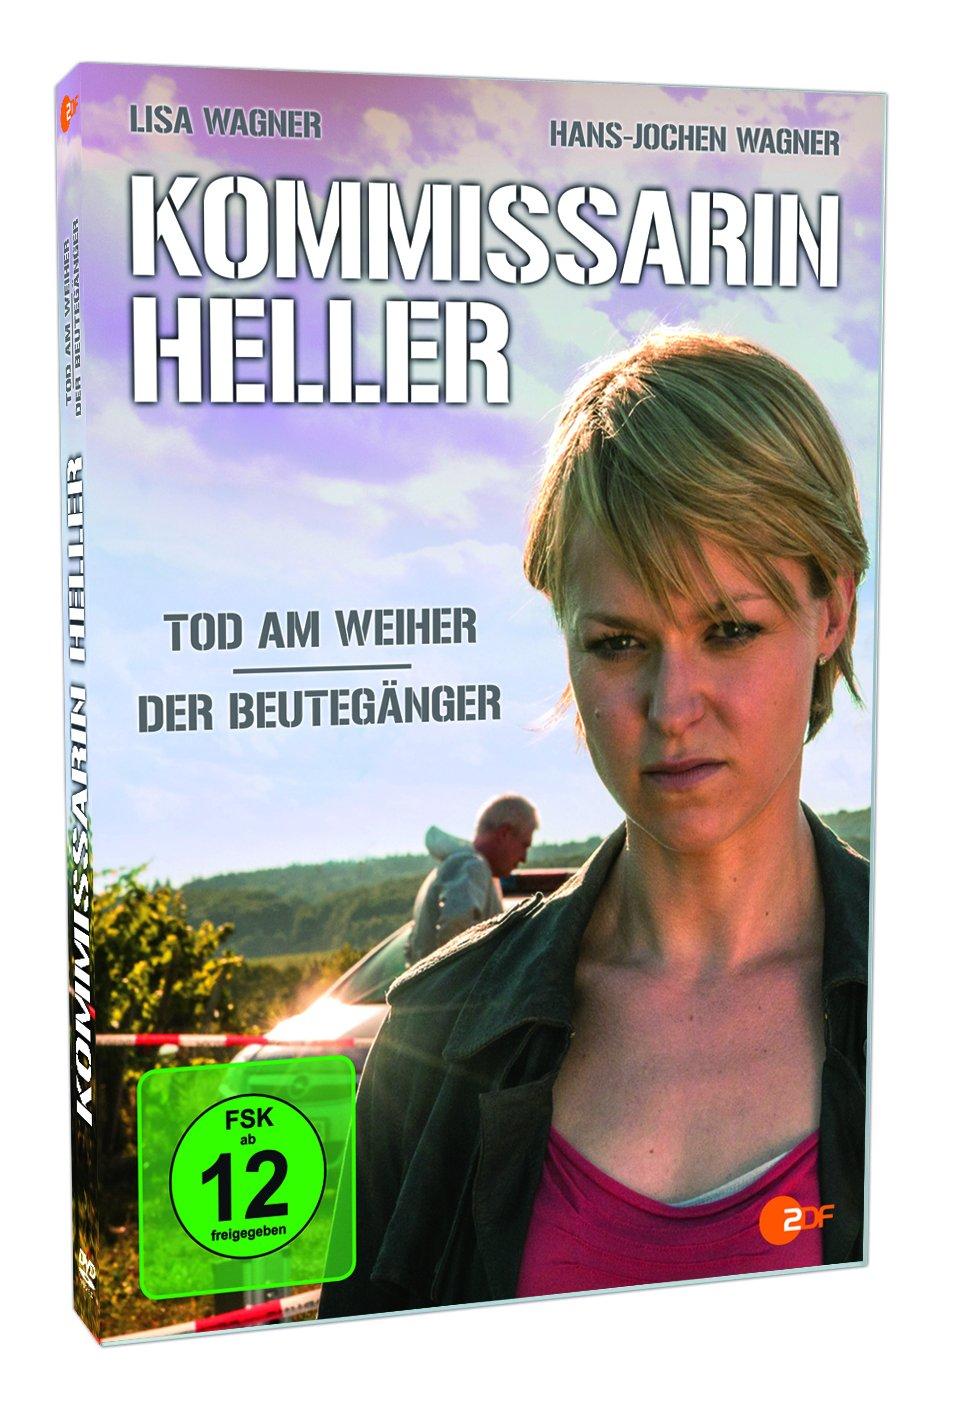 Amazon.com: Kommissarin Heller - Tod am Weiher & Der Beutegänger: Movies & TV